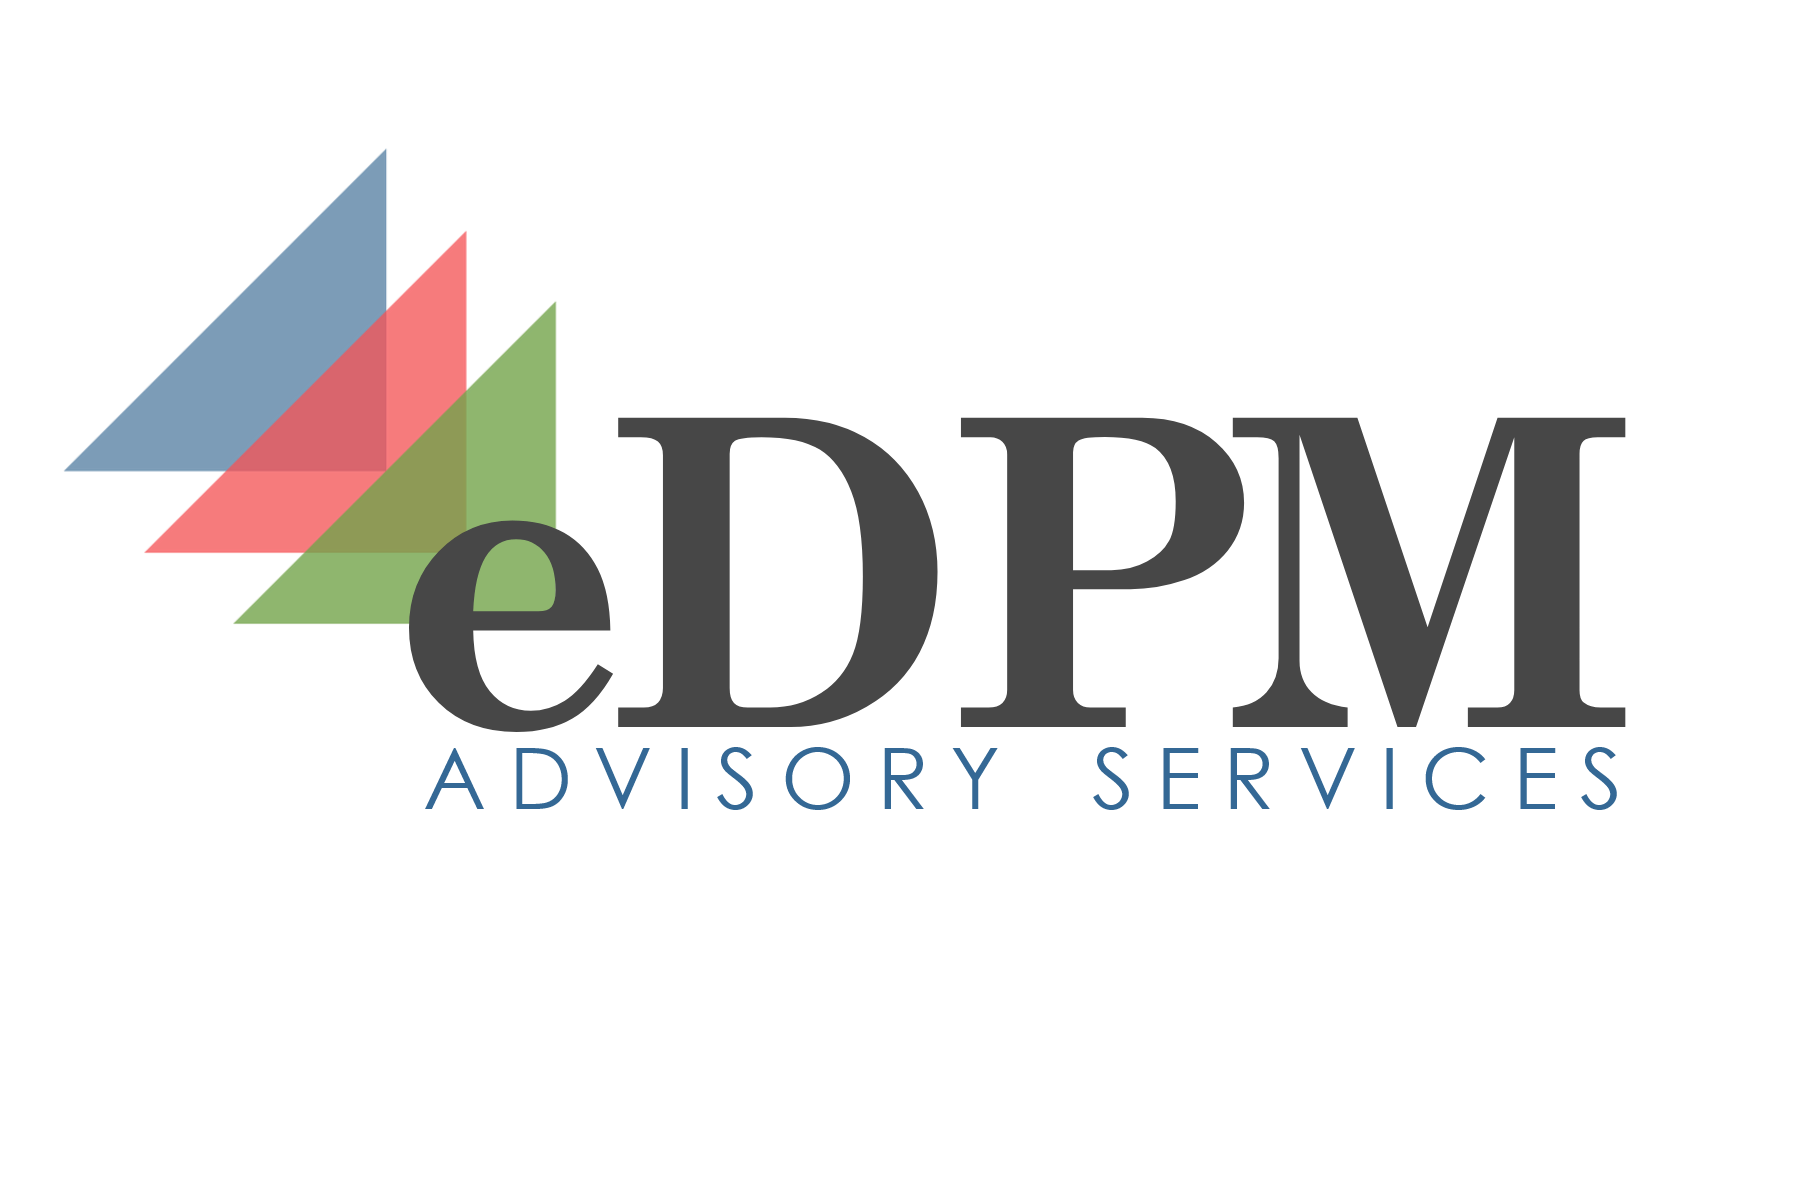 eDPM Advisory Services